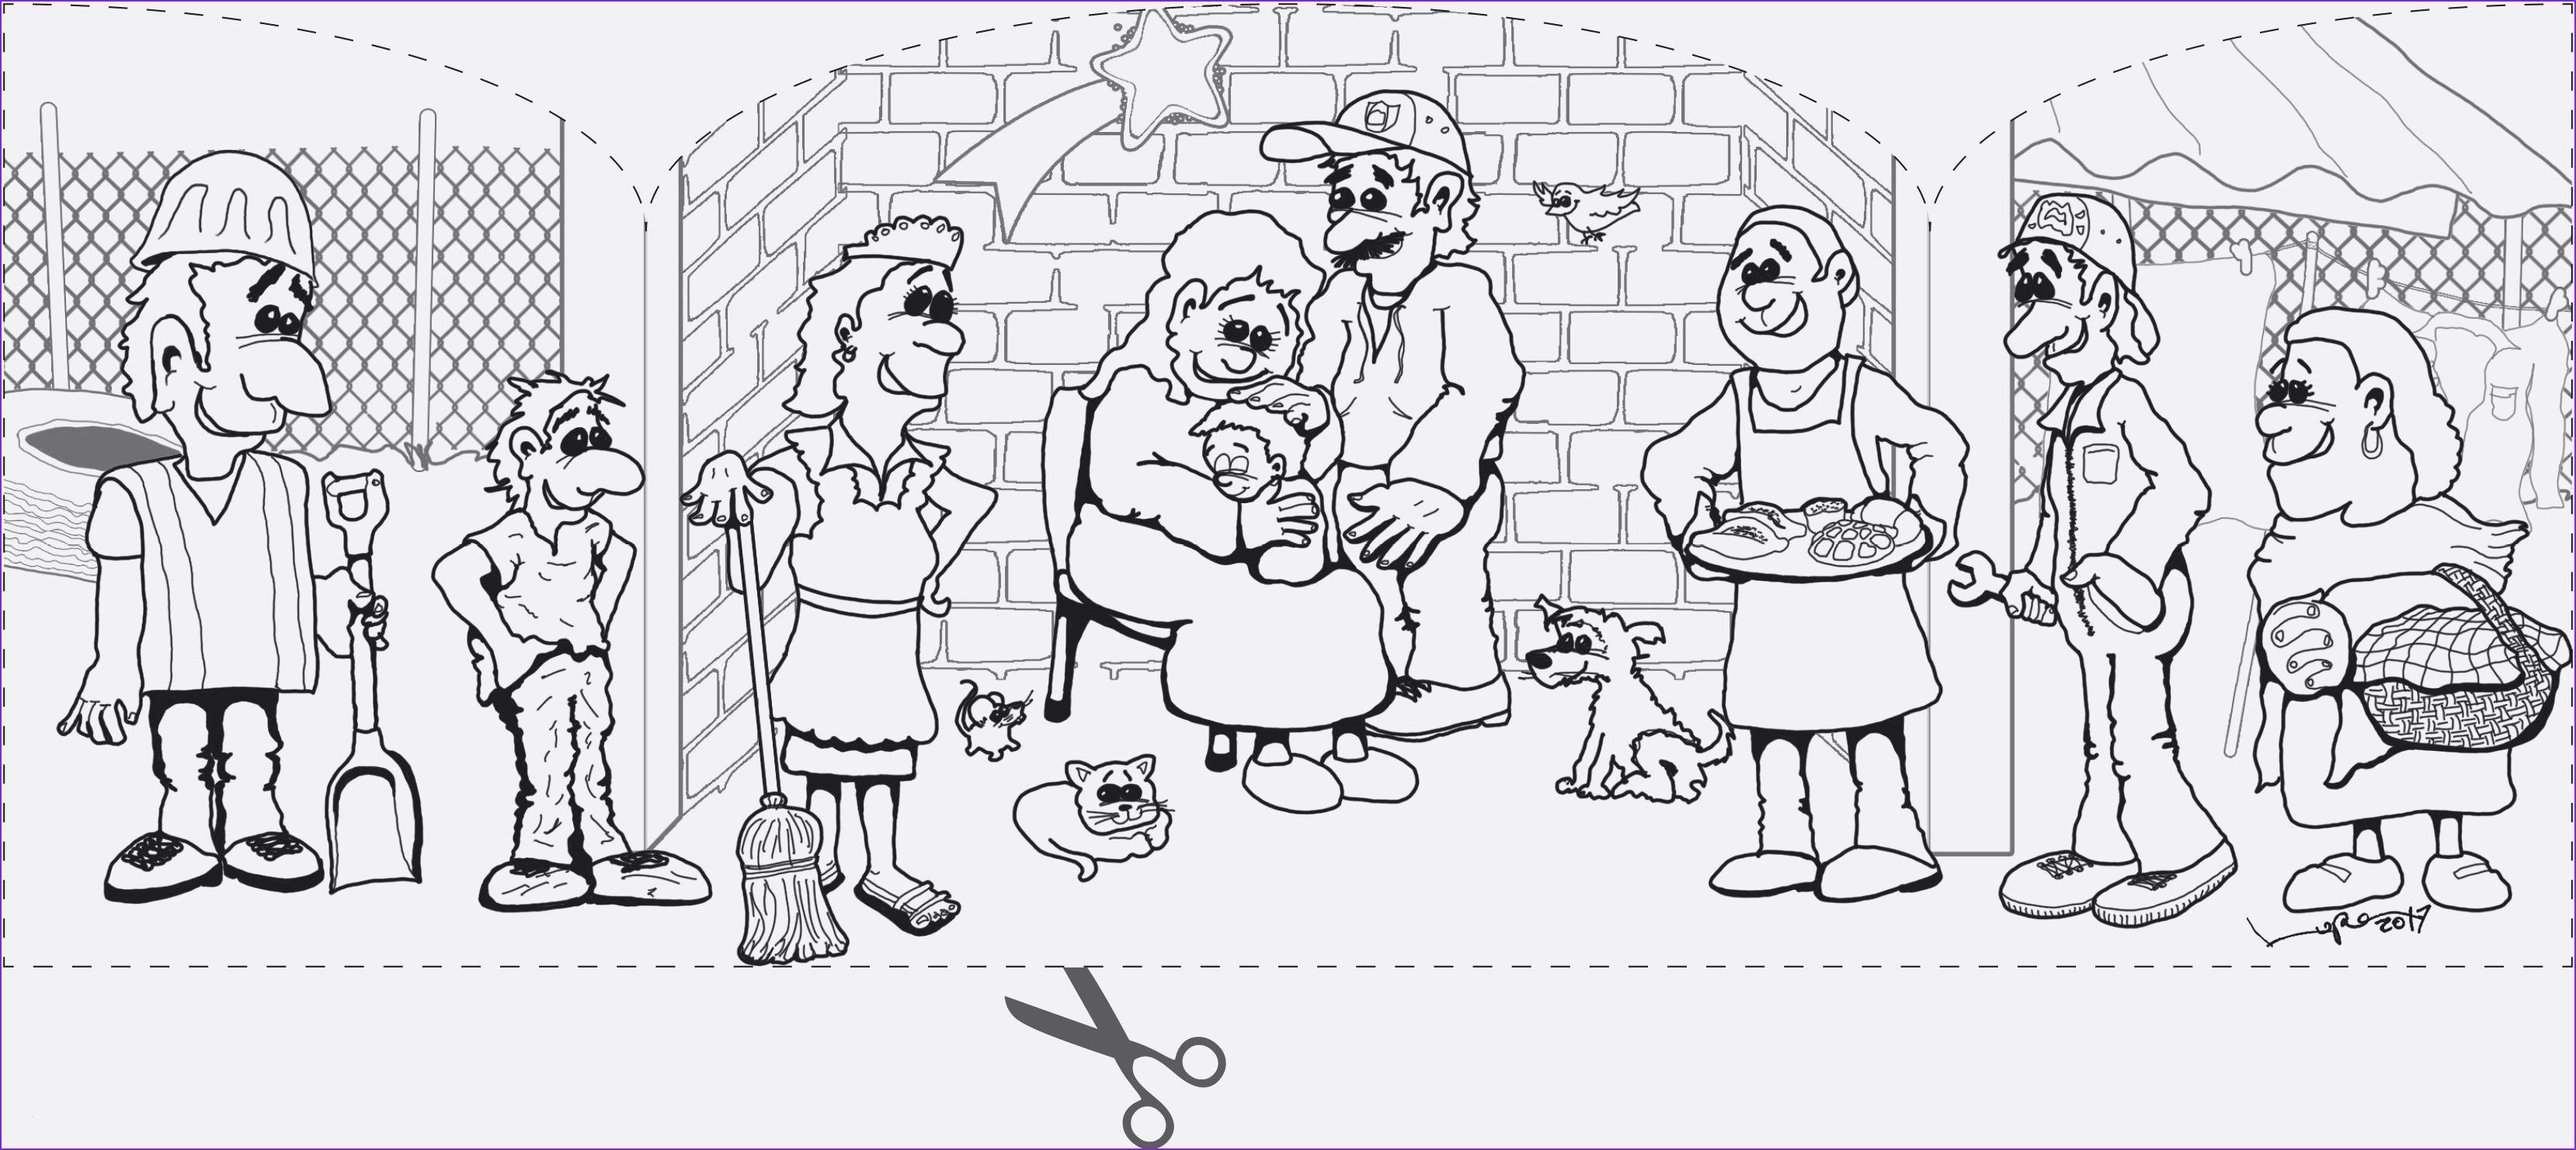 Hundertwasser Bilder Zum Ausmalen Genial Ausmalbilder Hundertwasser Ausmalbuchstabenore Das Bild